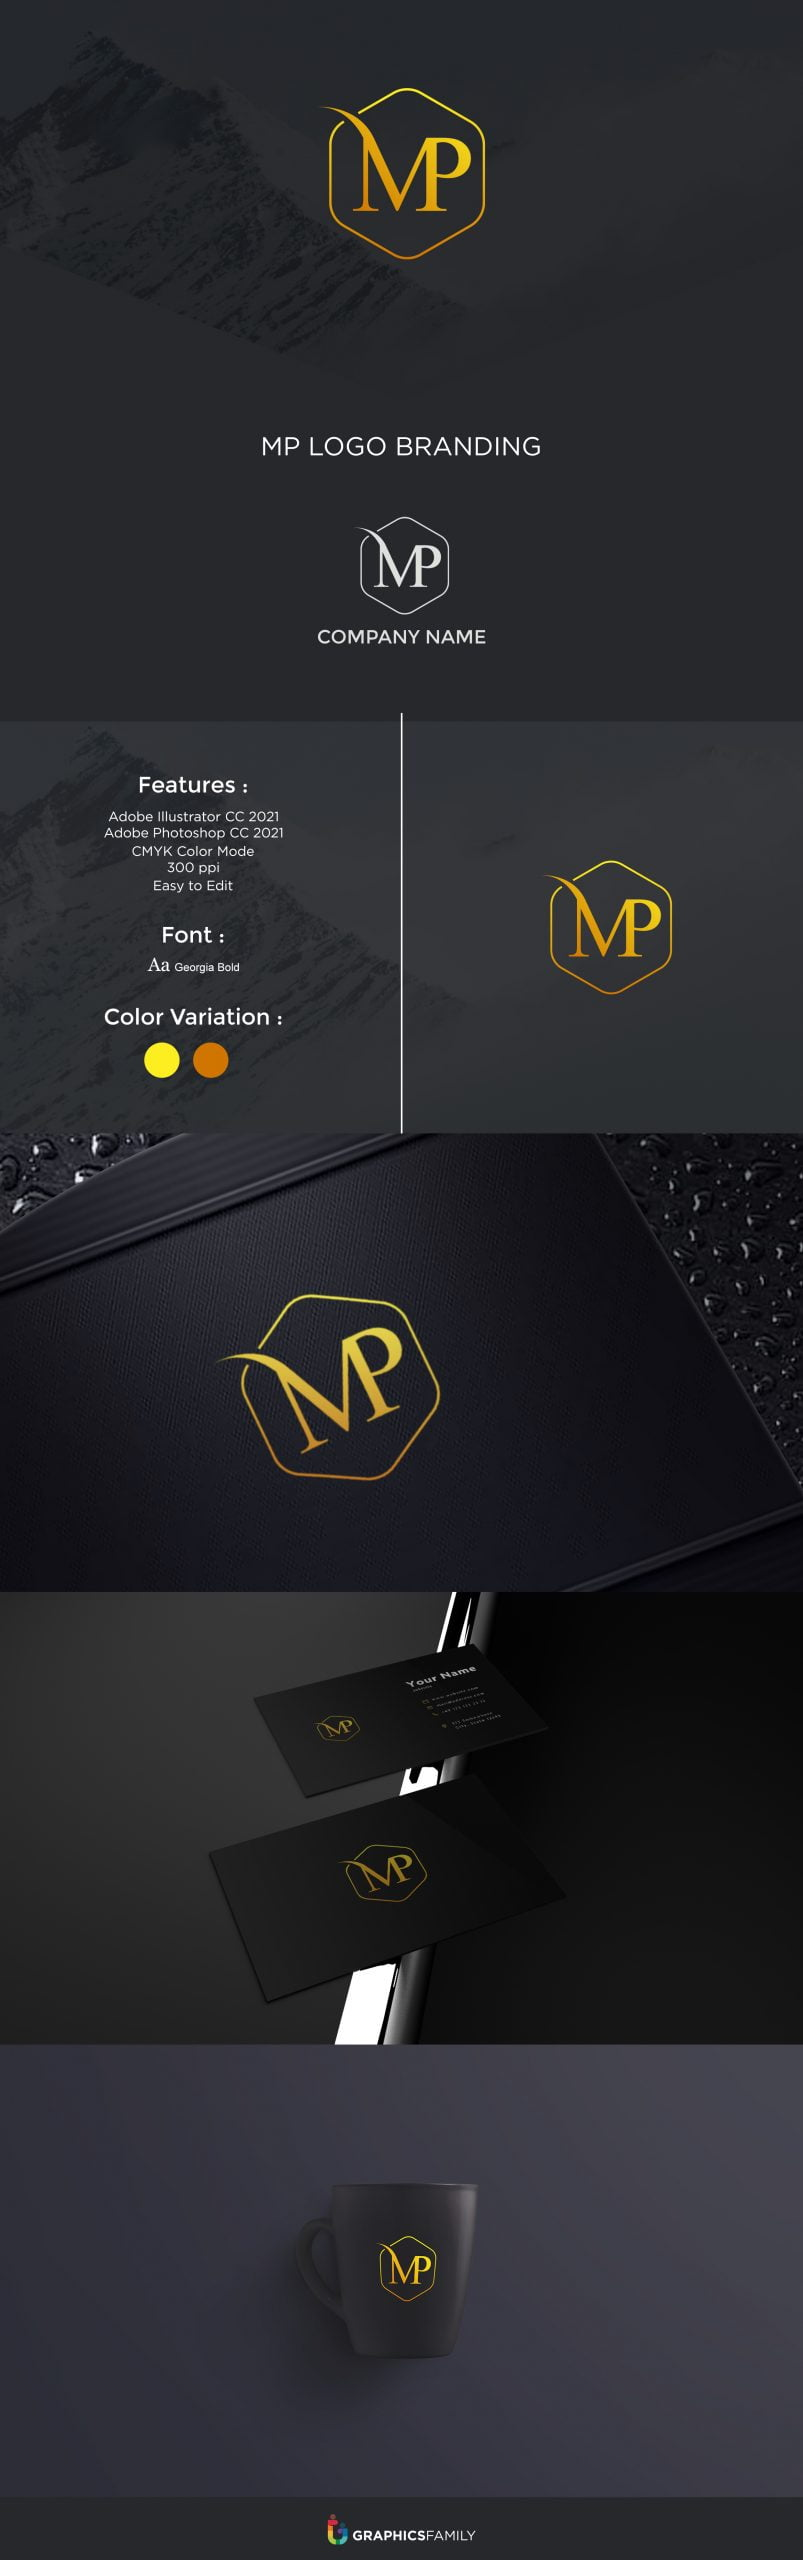 Professional MP Logo Design Download